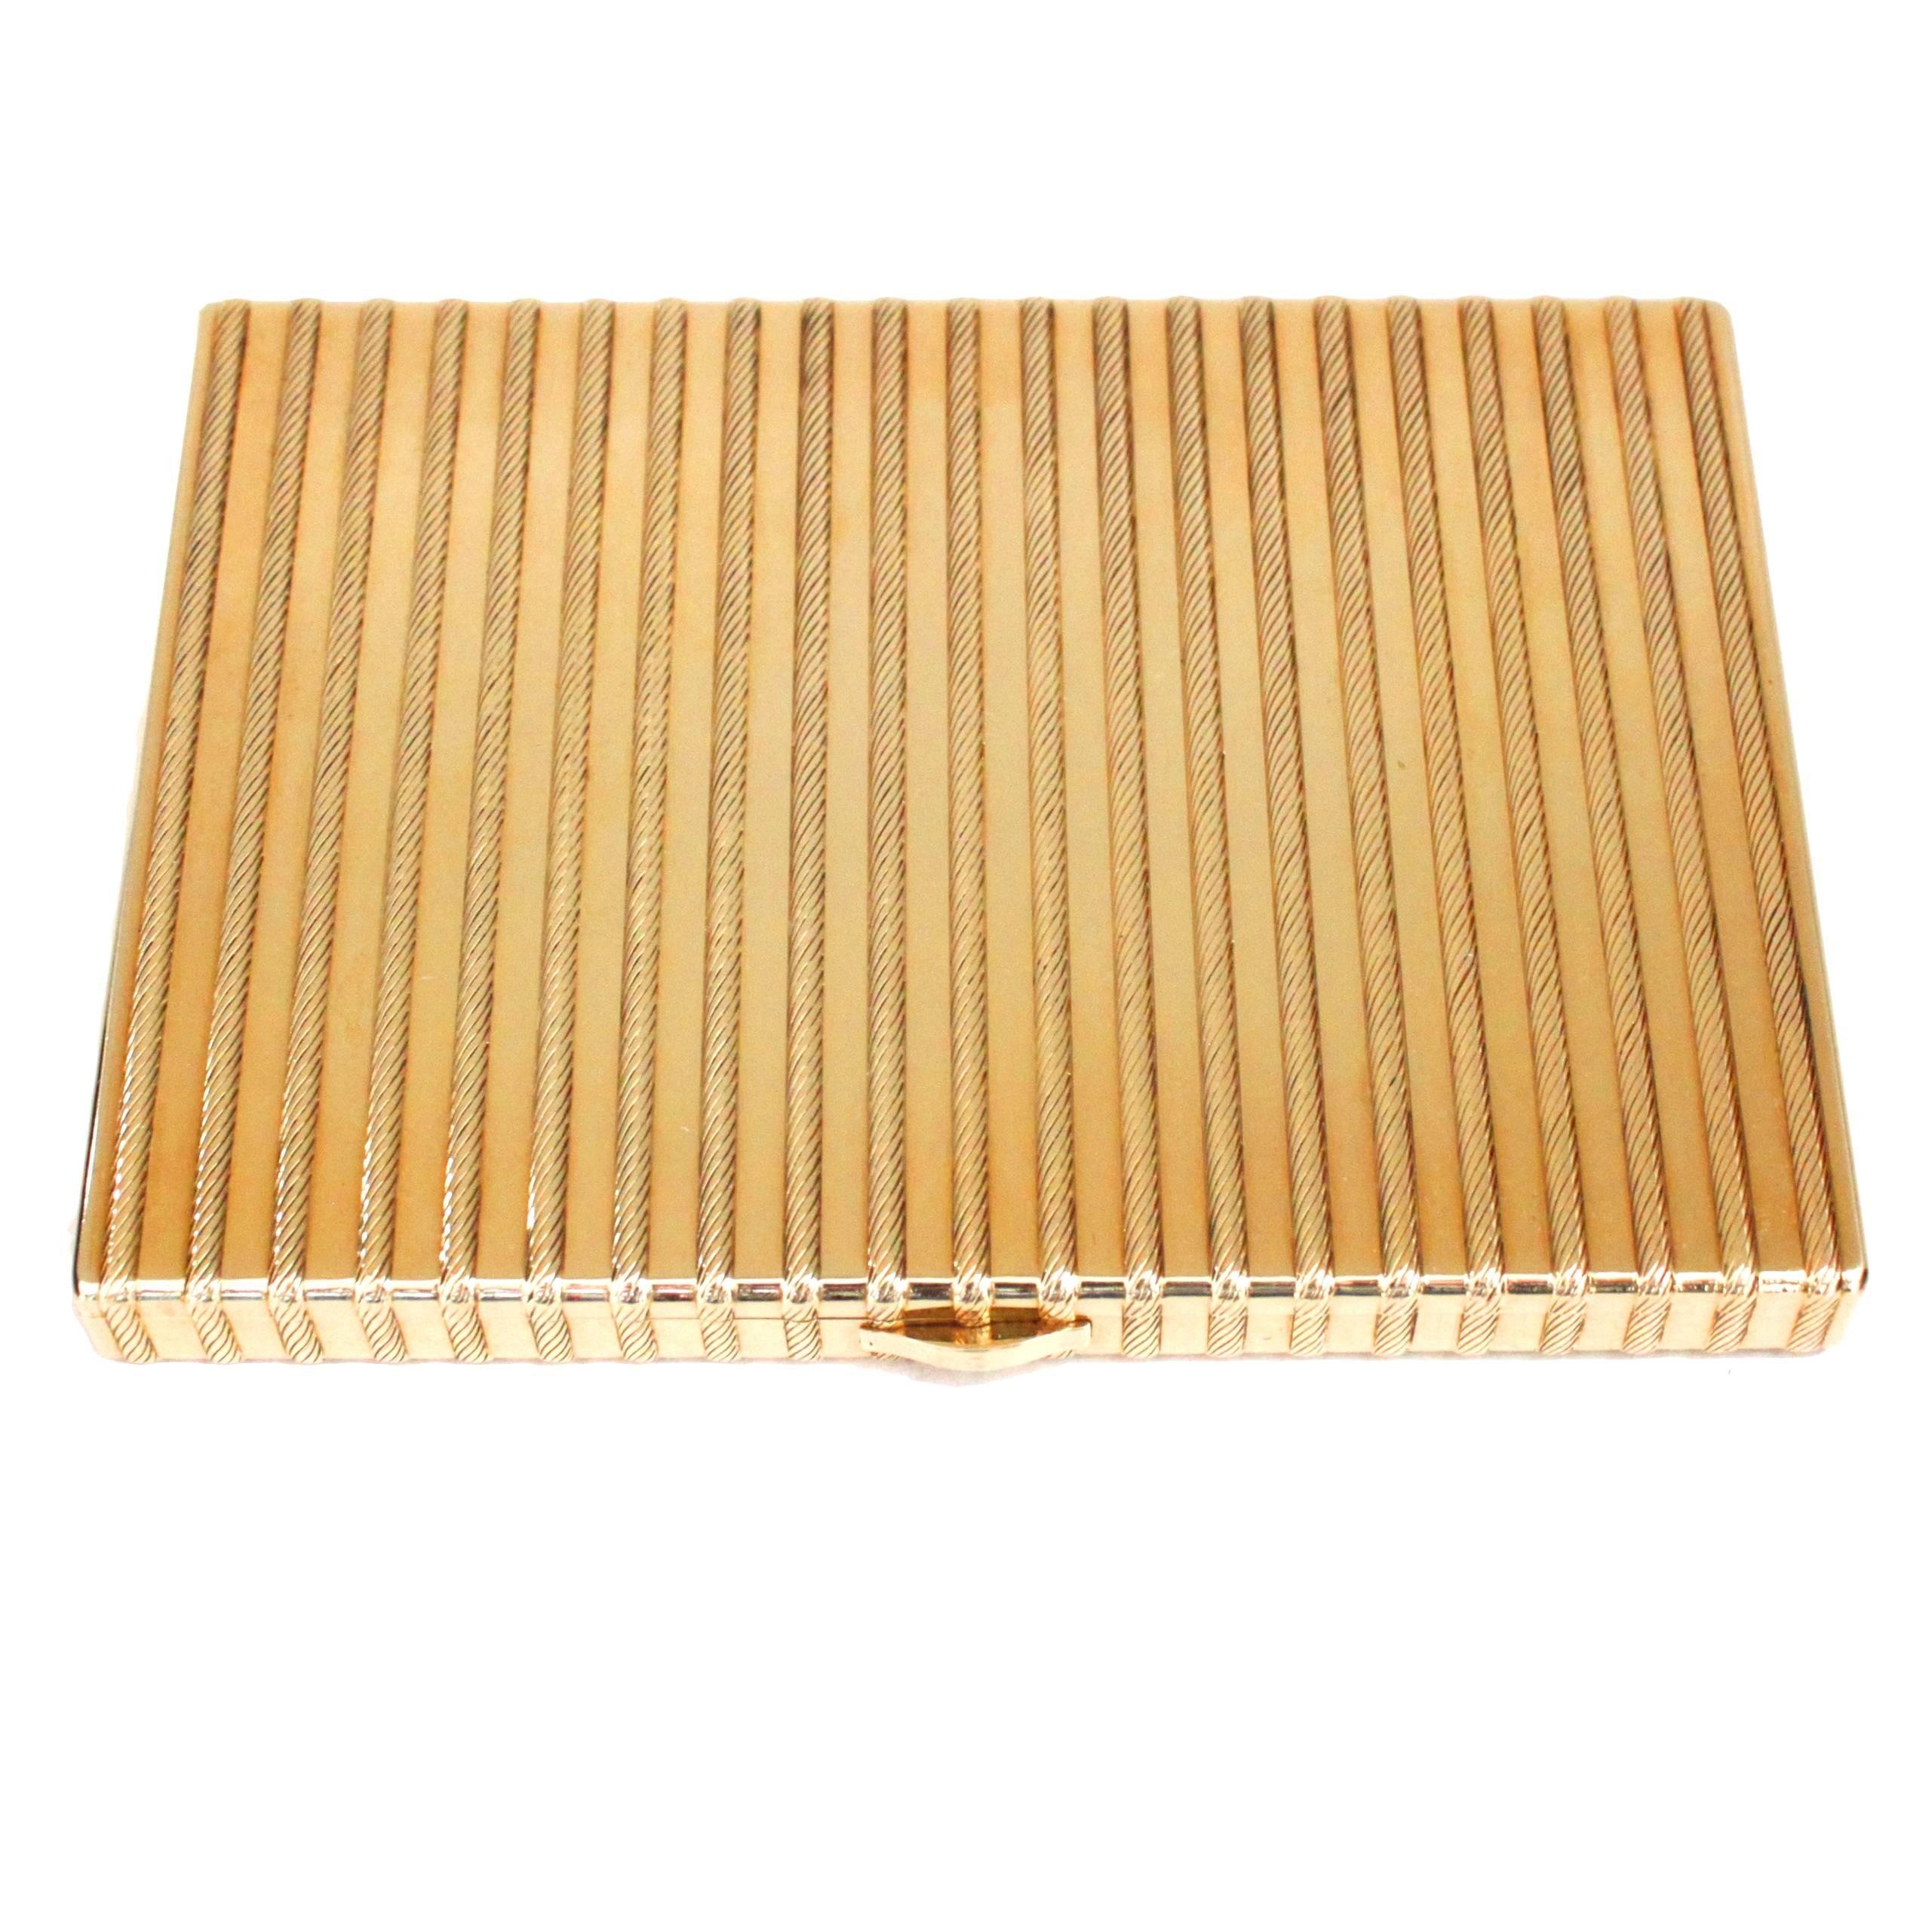 Cartier 18 Karat Gold Rope Cigarette Case